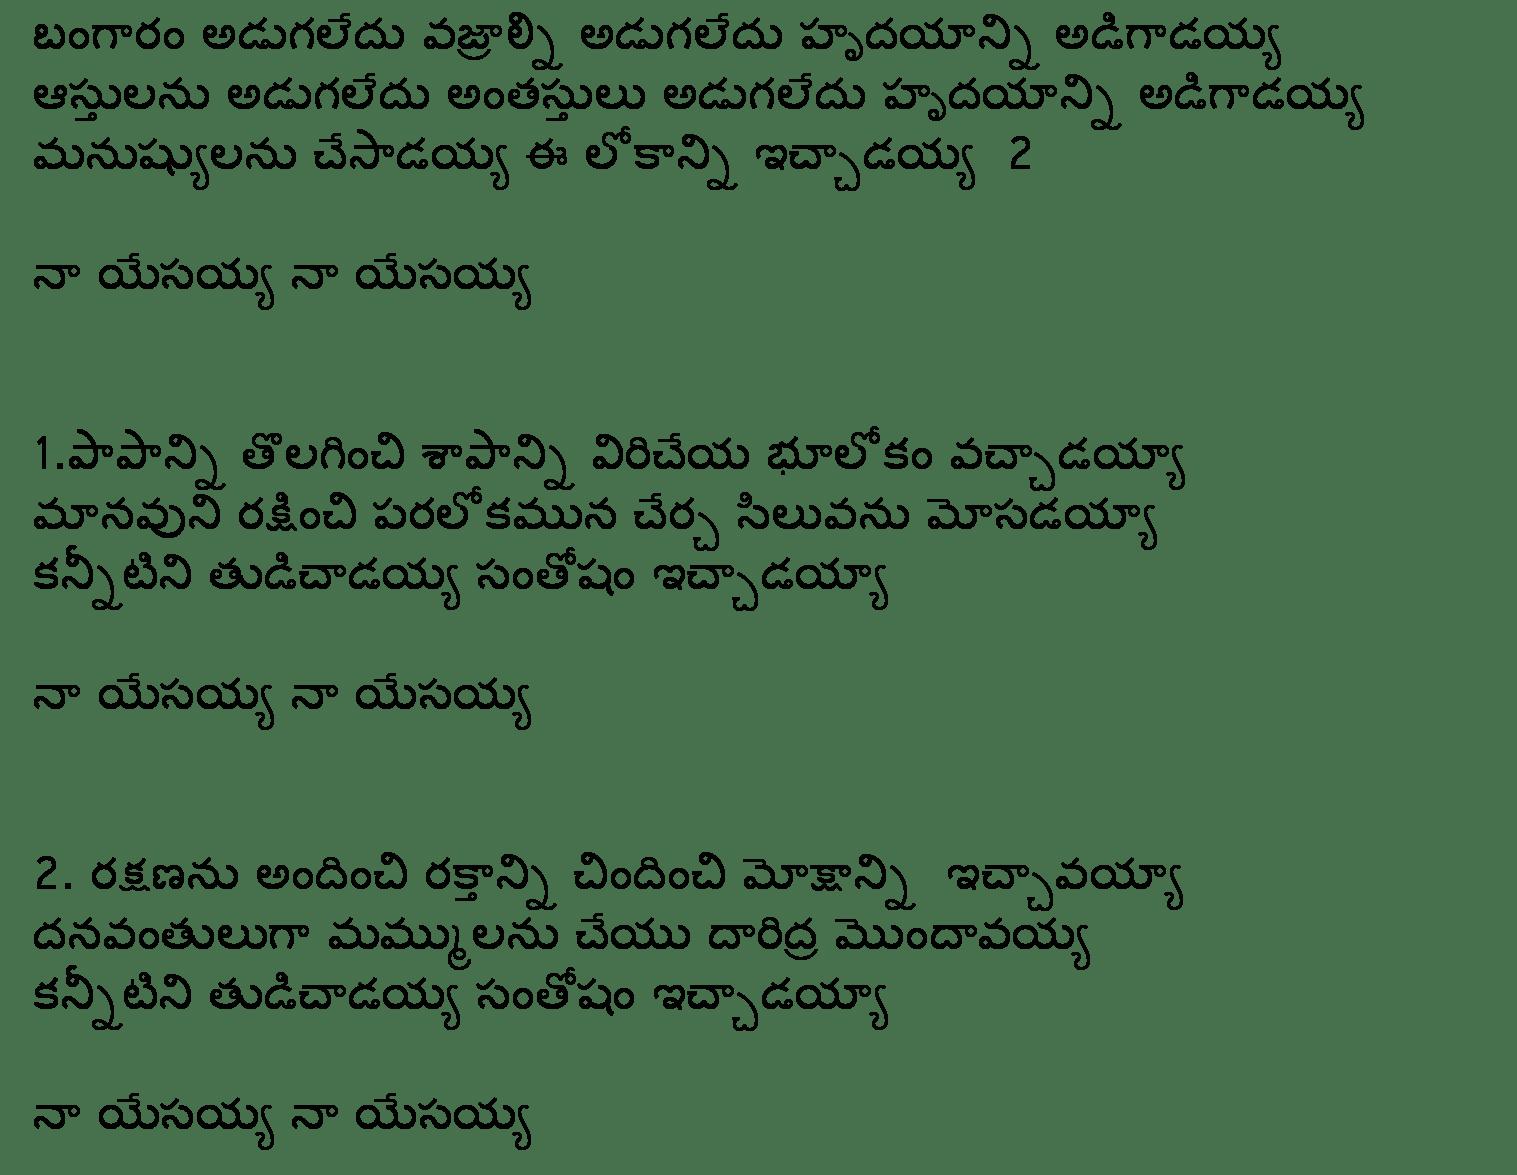 Old Telugu Jesus Songs Free Download Mp3 Format - losttoday